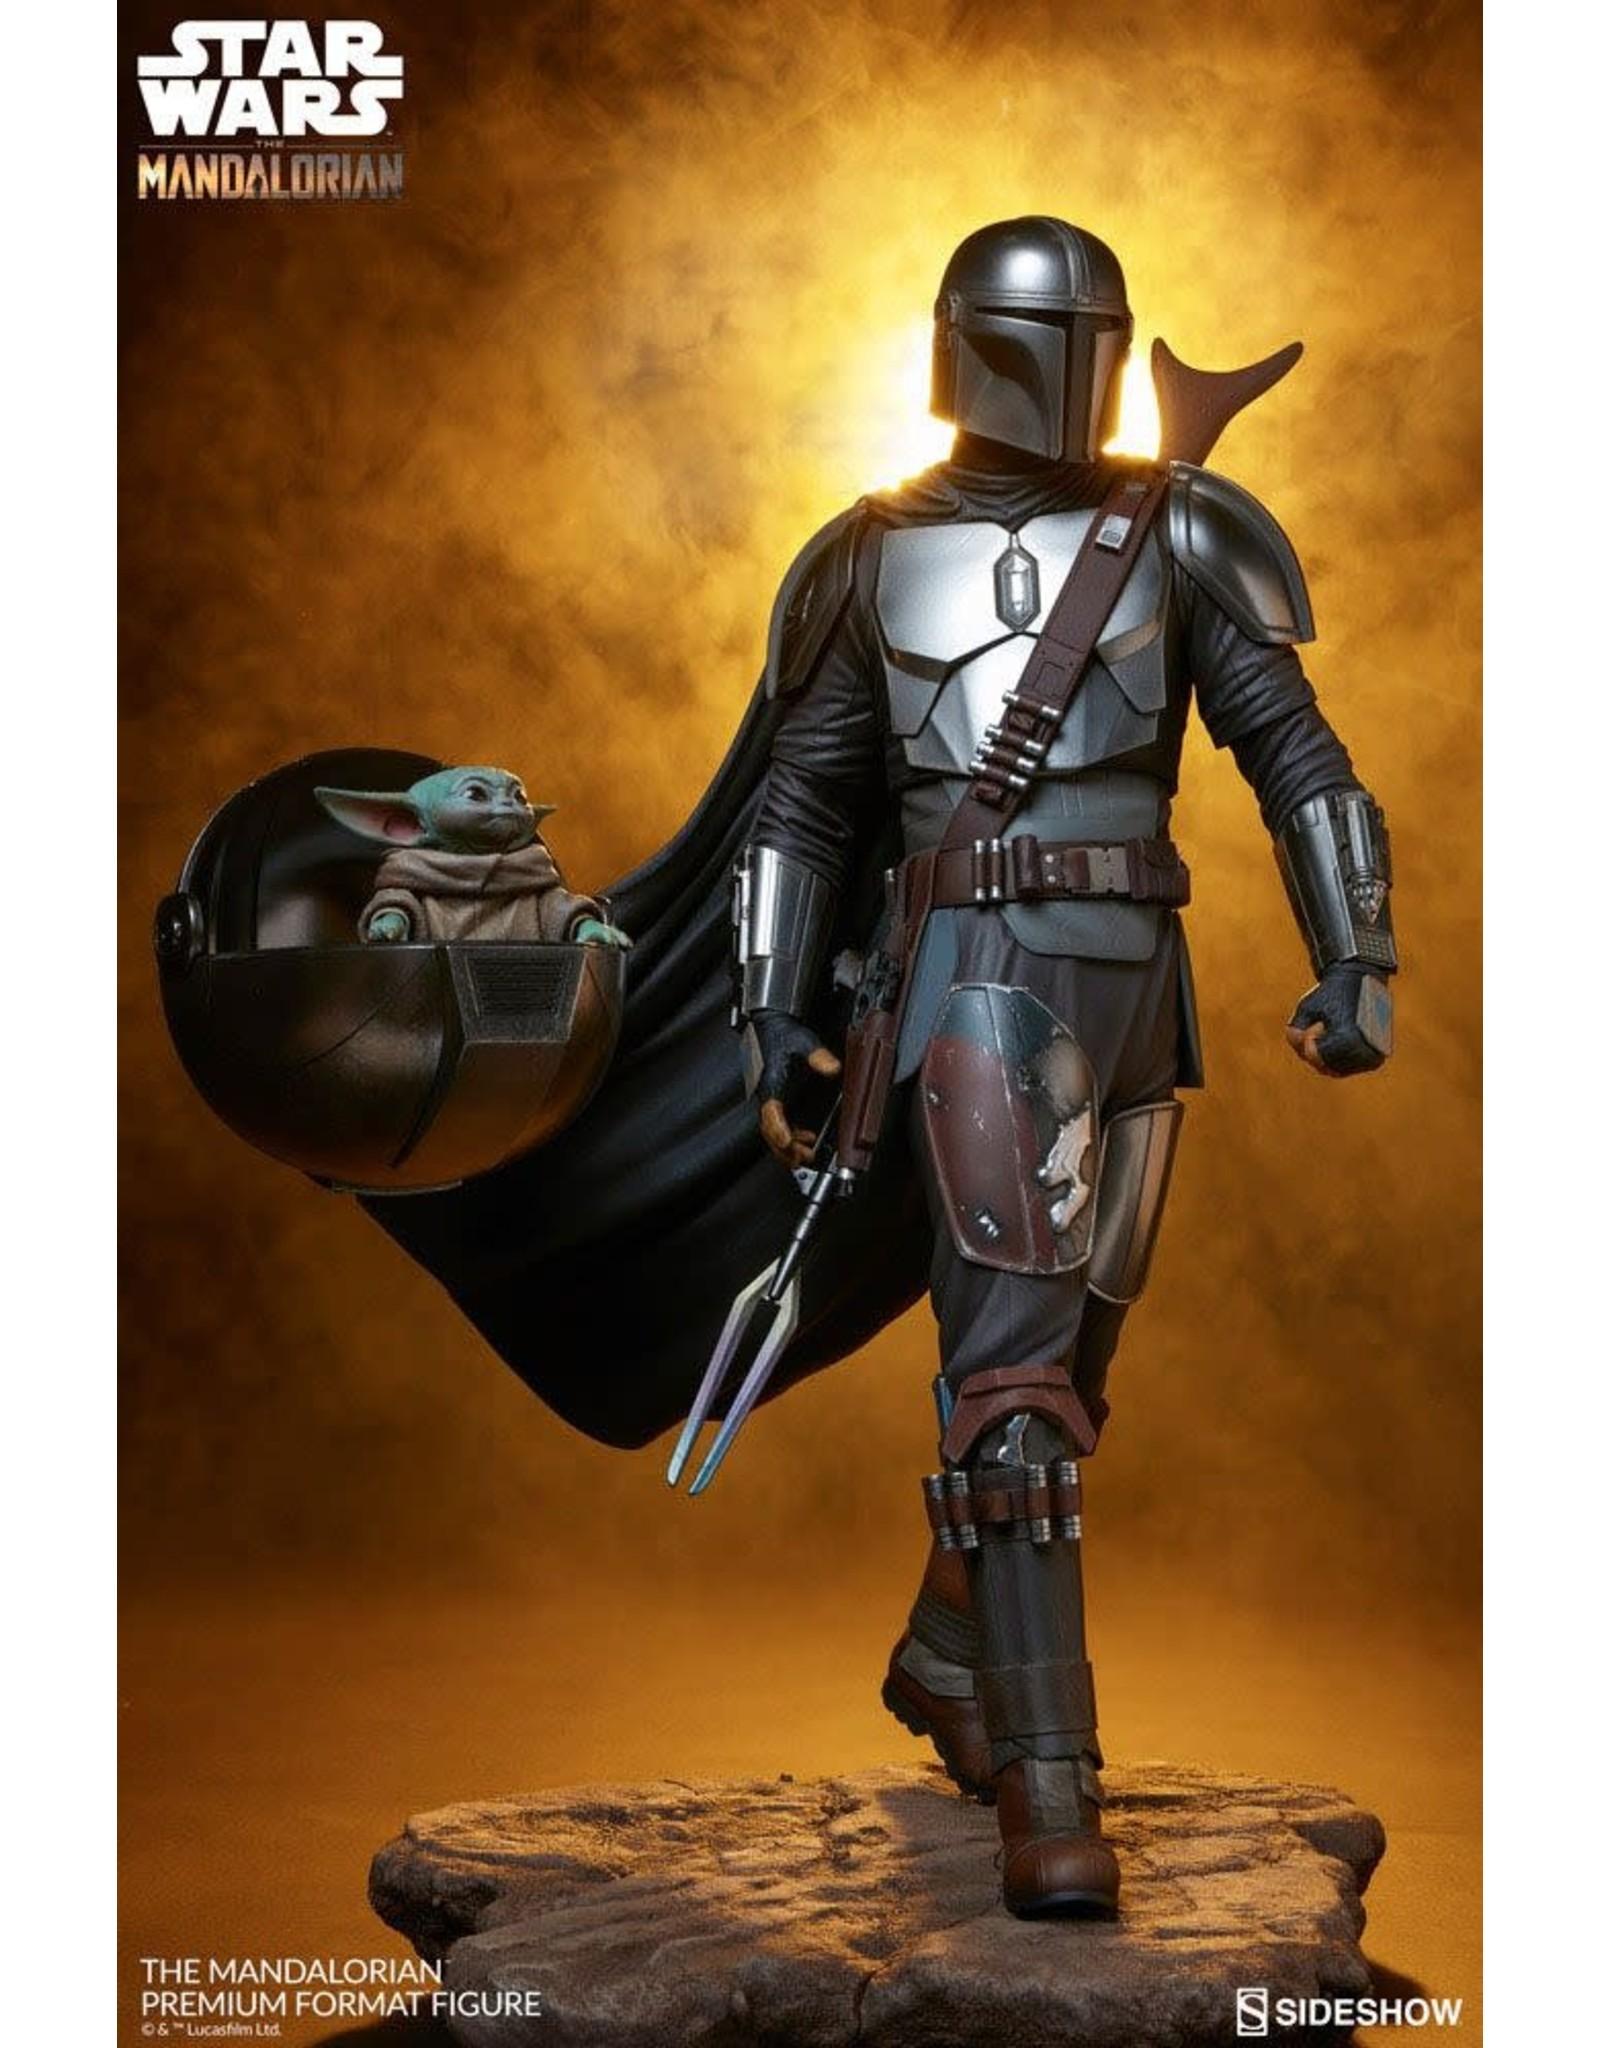 Sideshow Collectibles STAR WARS Premium Statue 1/4 Scale 51cm - The Mandalorian